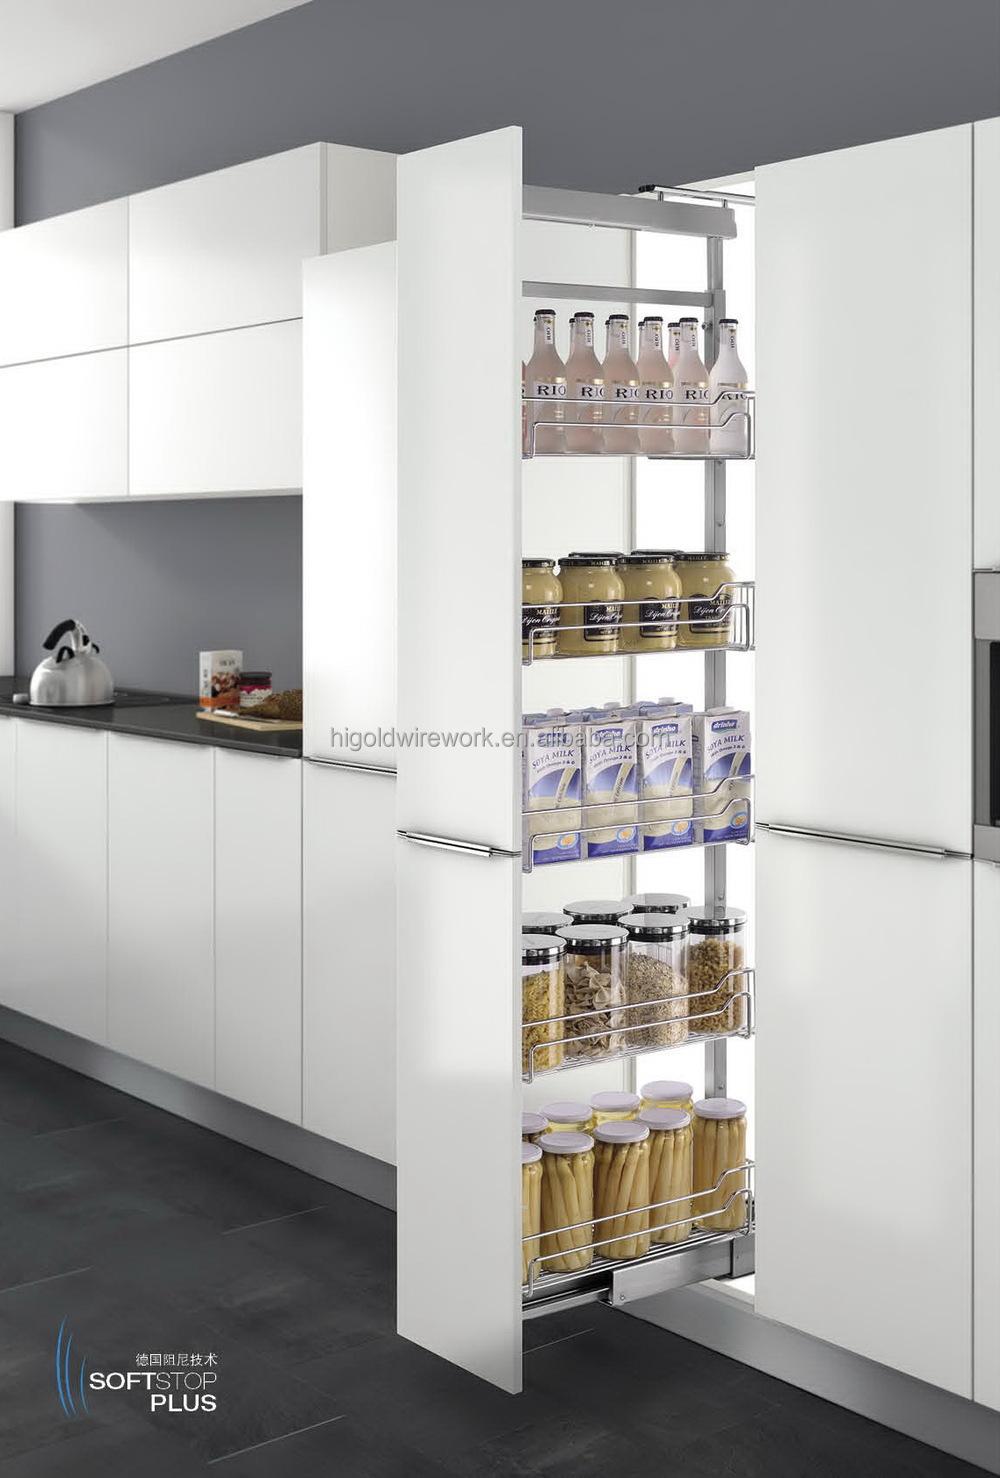 modular kitchen baskets designs. how we can set modular kitchen